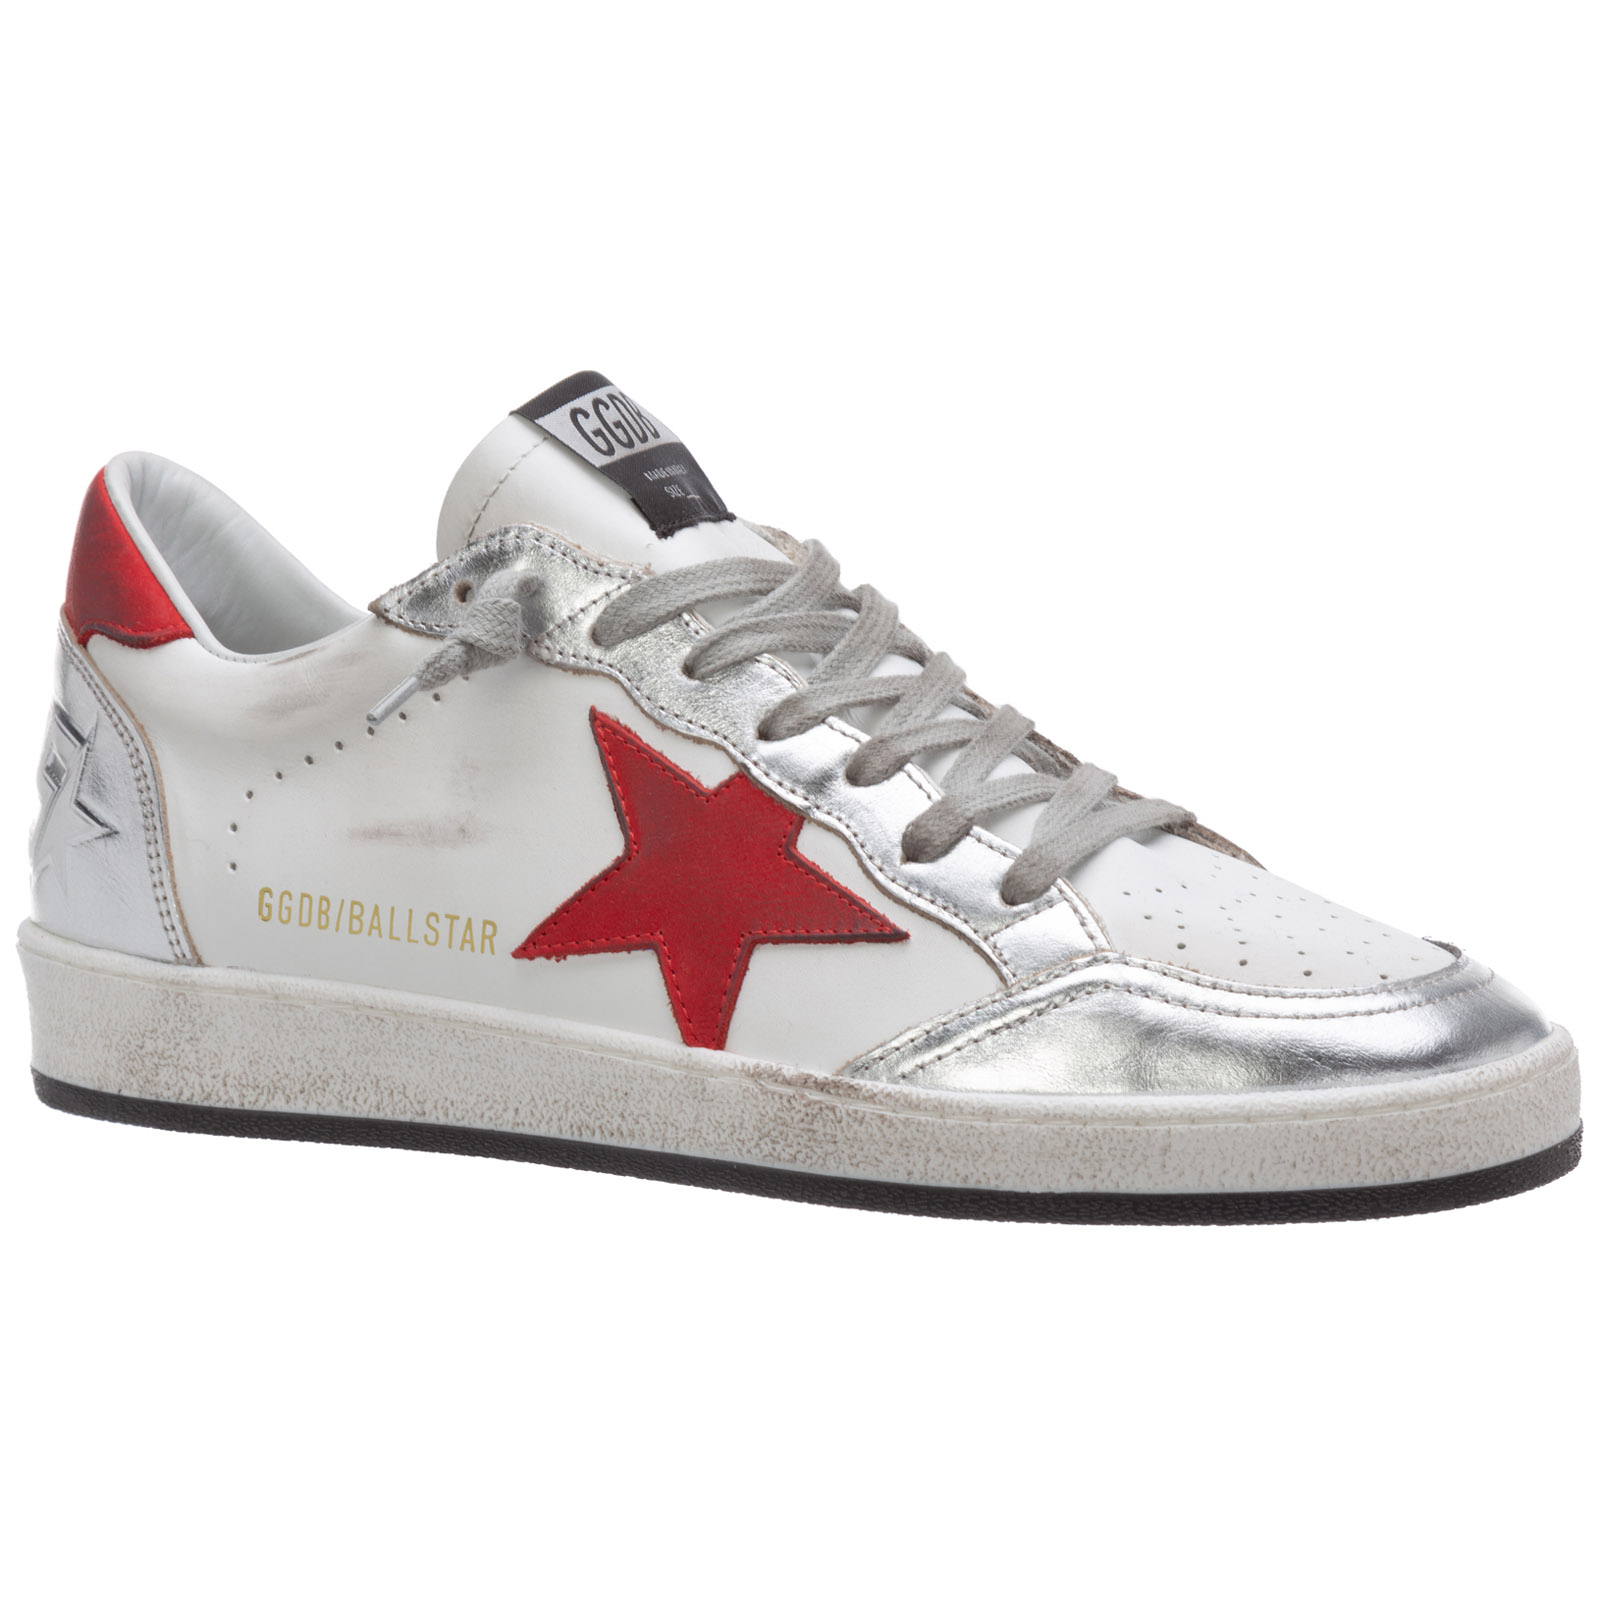 Sneakers Golden Goose ball star